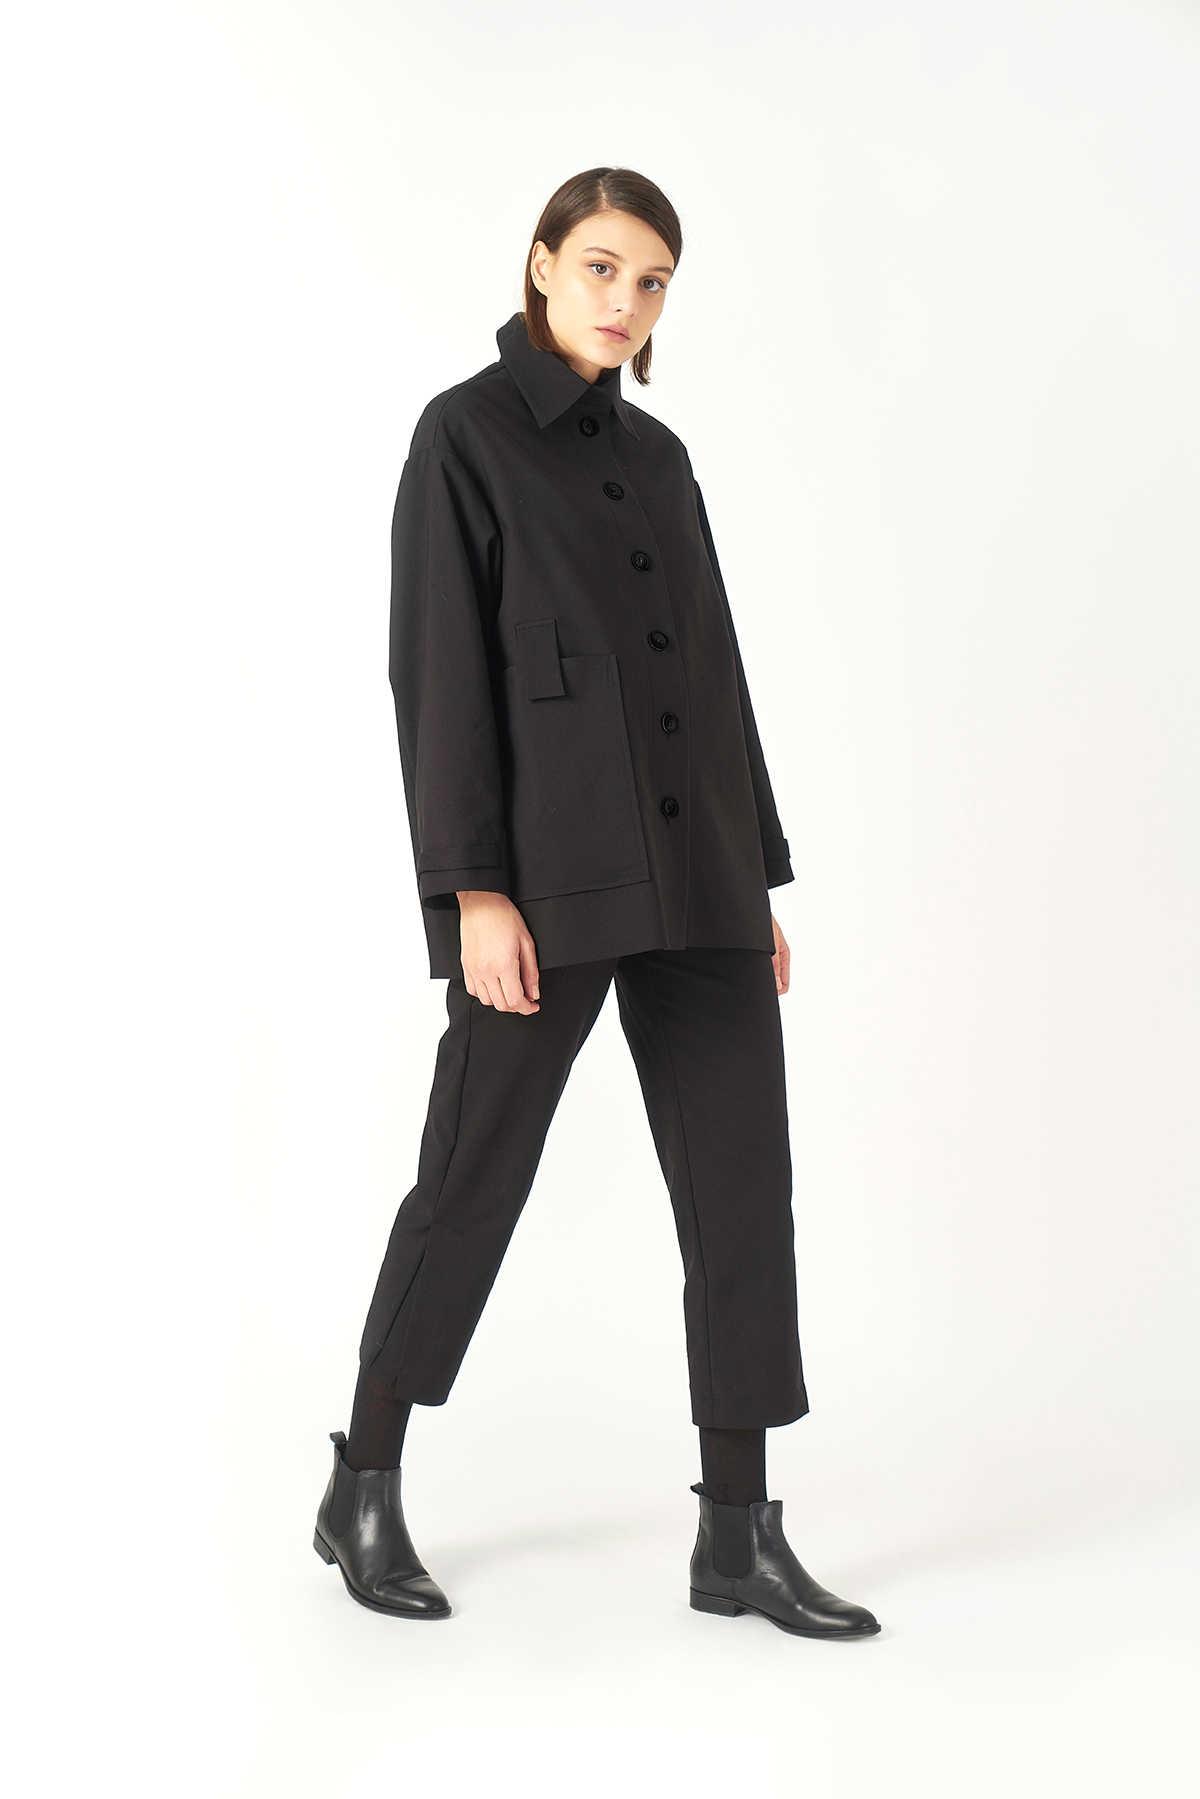 Kuaybe Gider Siyah Kadın Palto 7103